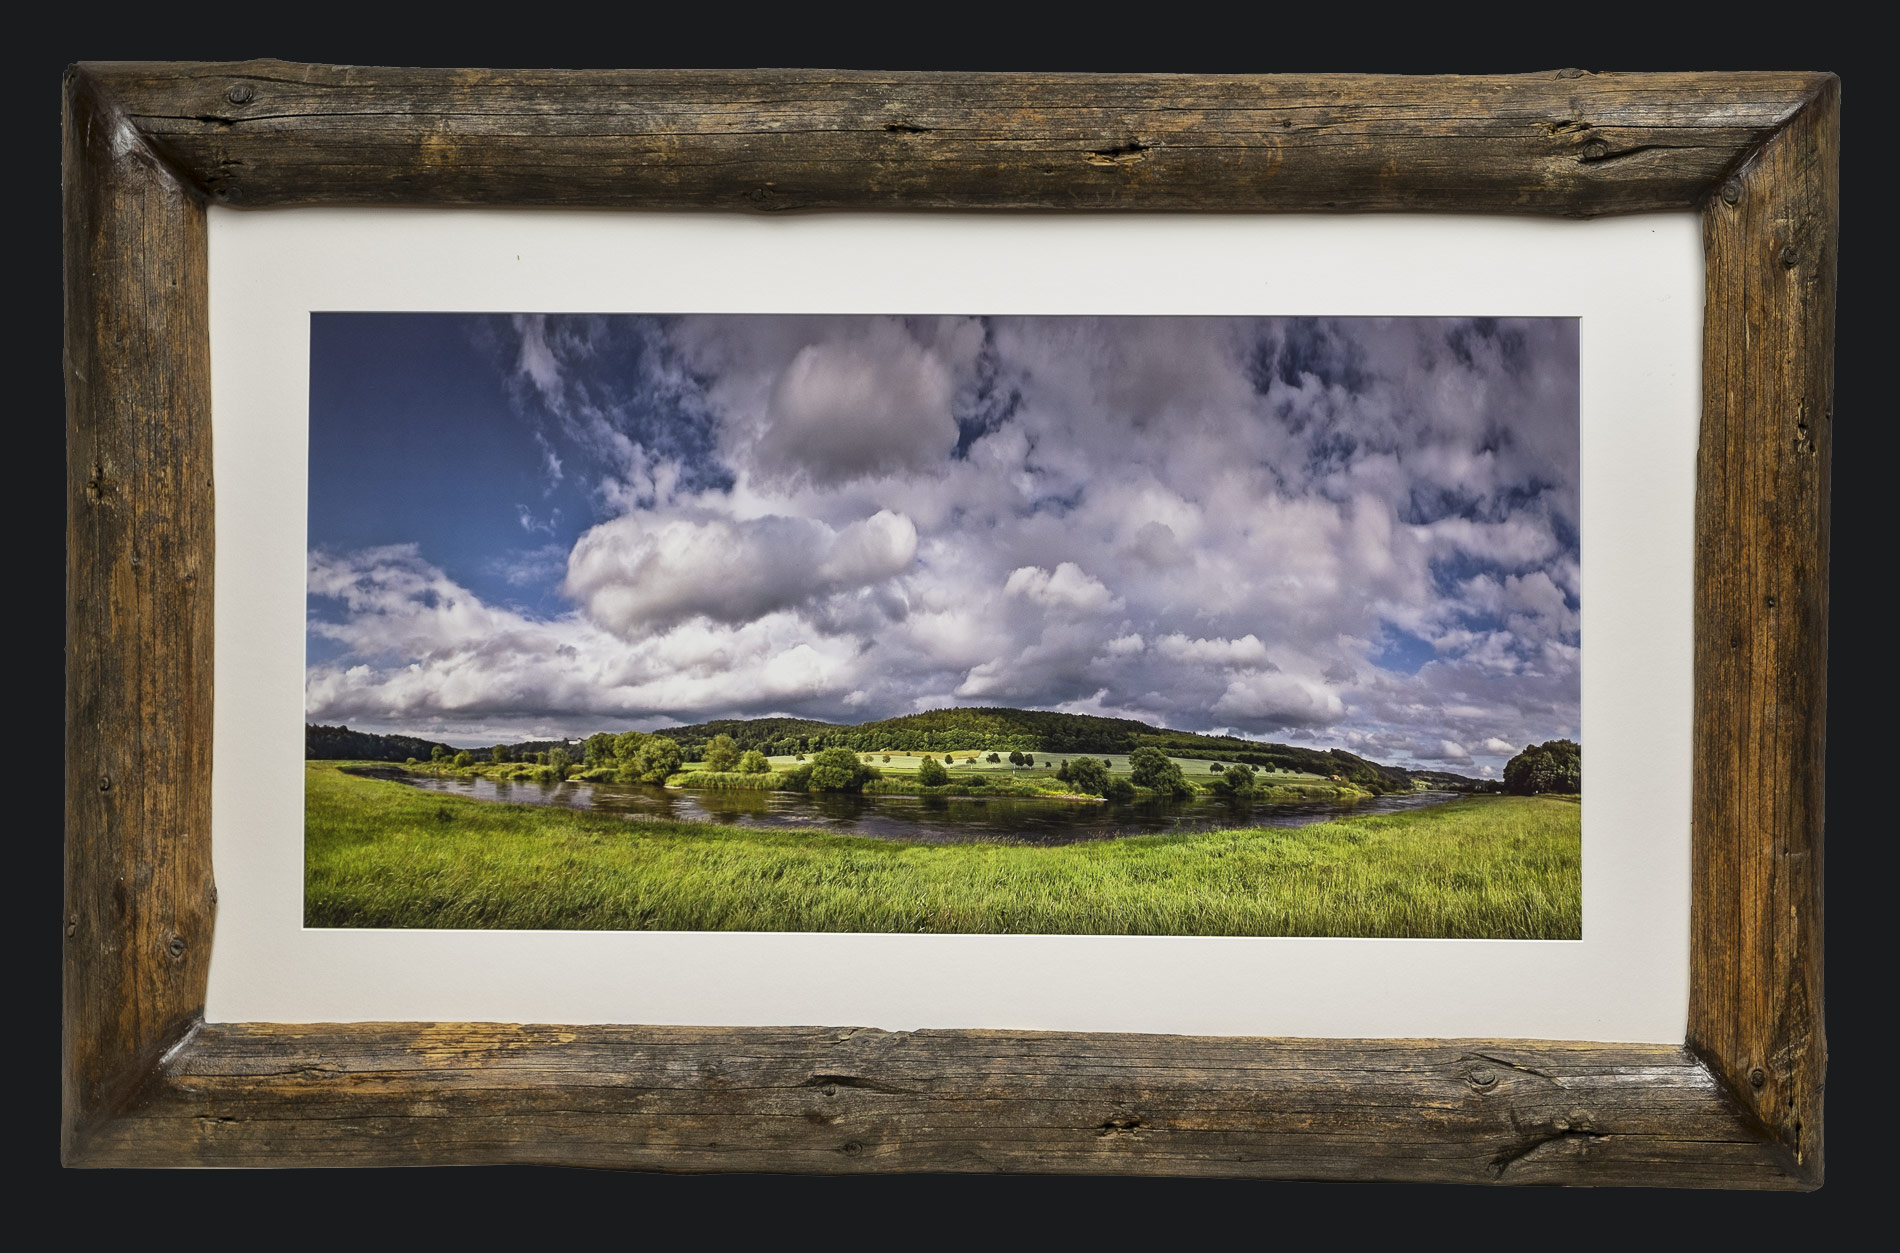 Naturholz-Bilderrahmen - Tores Art